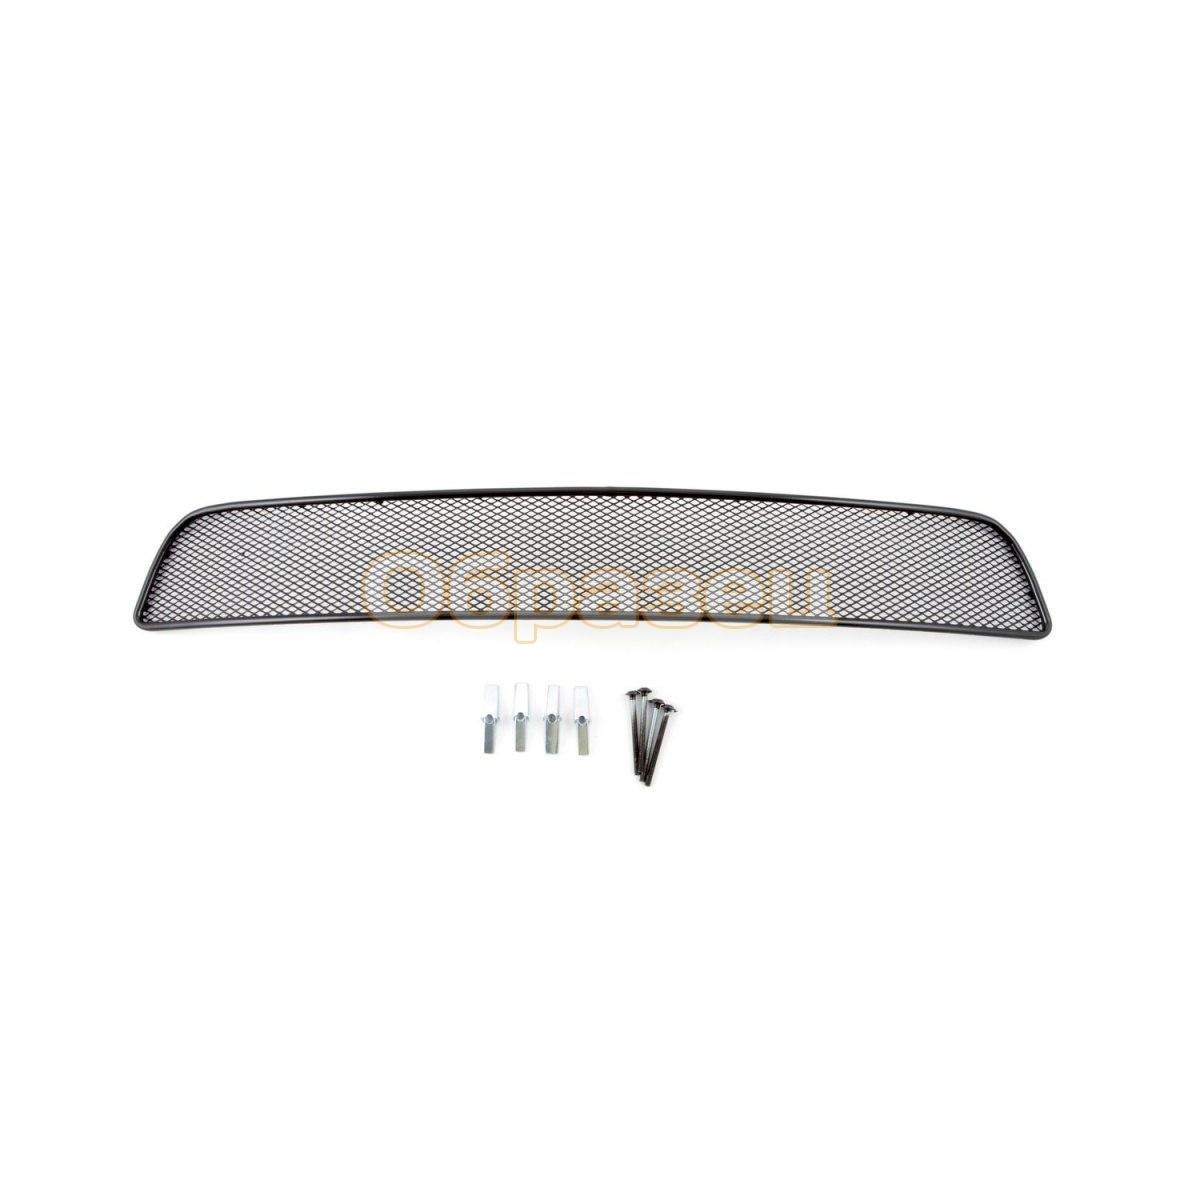 Mesh On Bumper External For Opel Astra H 2004-2011, Black, 15mm (Opel)